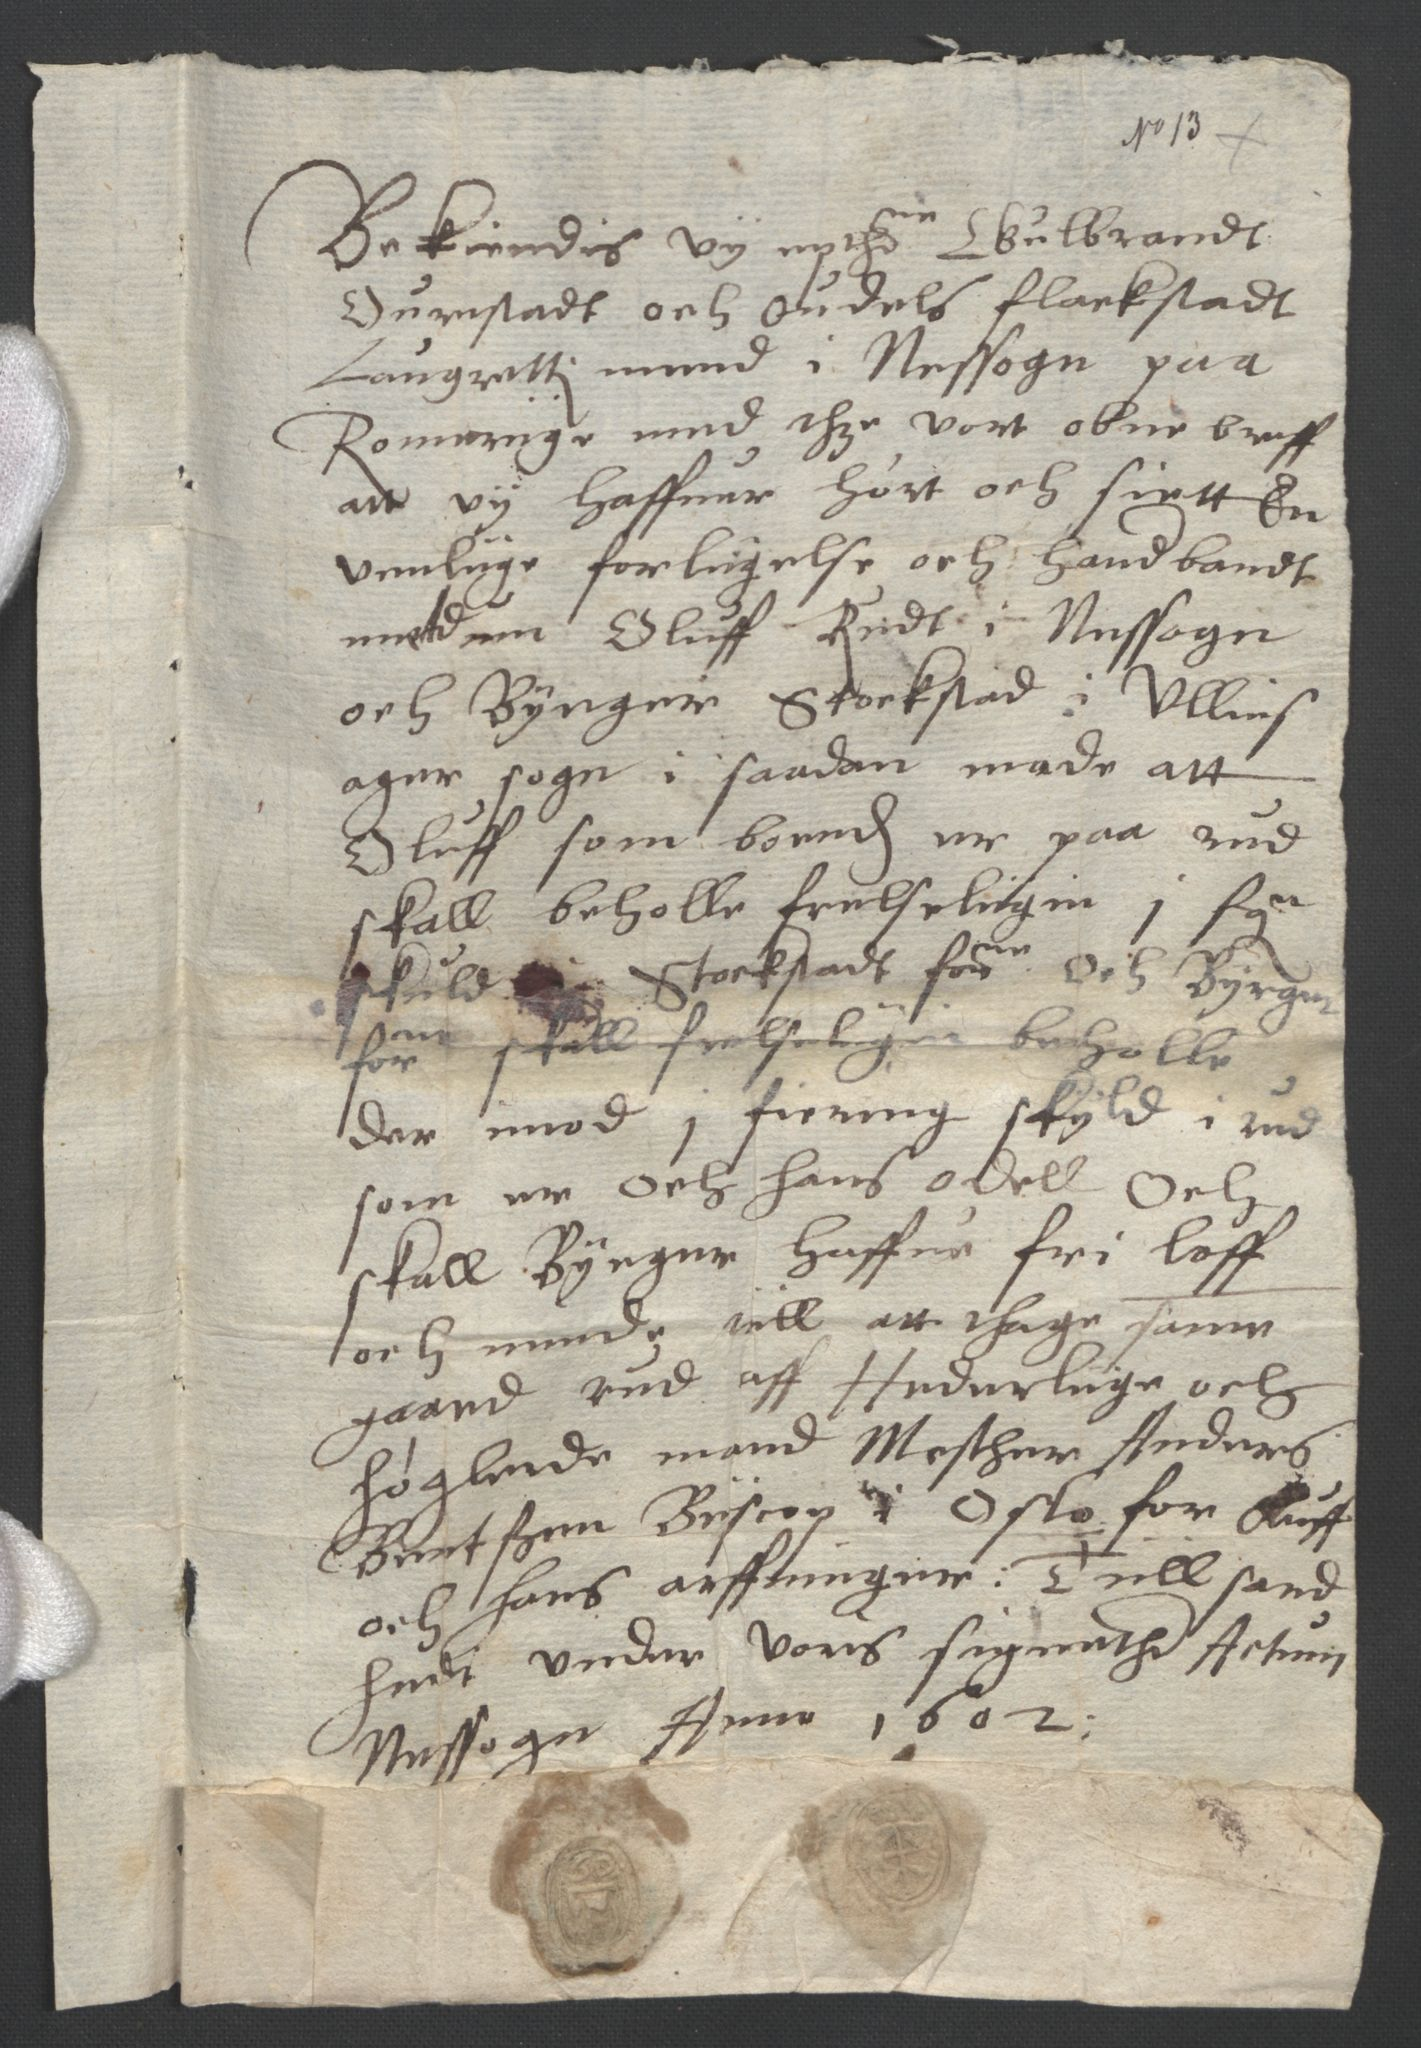 SAO, Oslo stiftsdireksjon, G/Gb/L0001: Bispestolens dokumenter, 1584-1612, s. 13